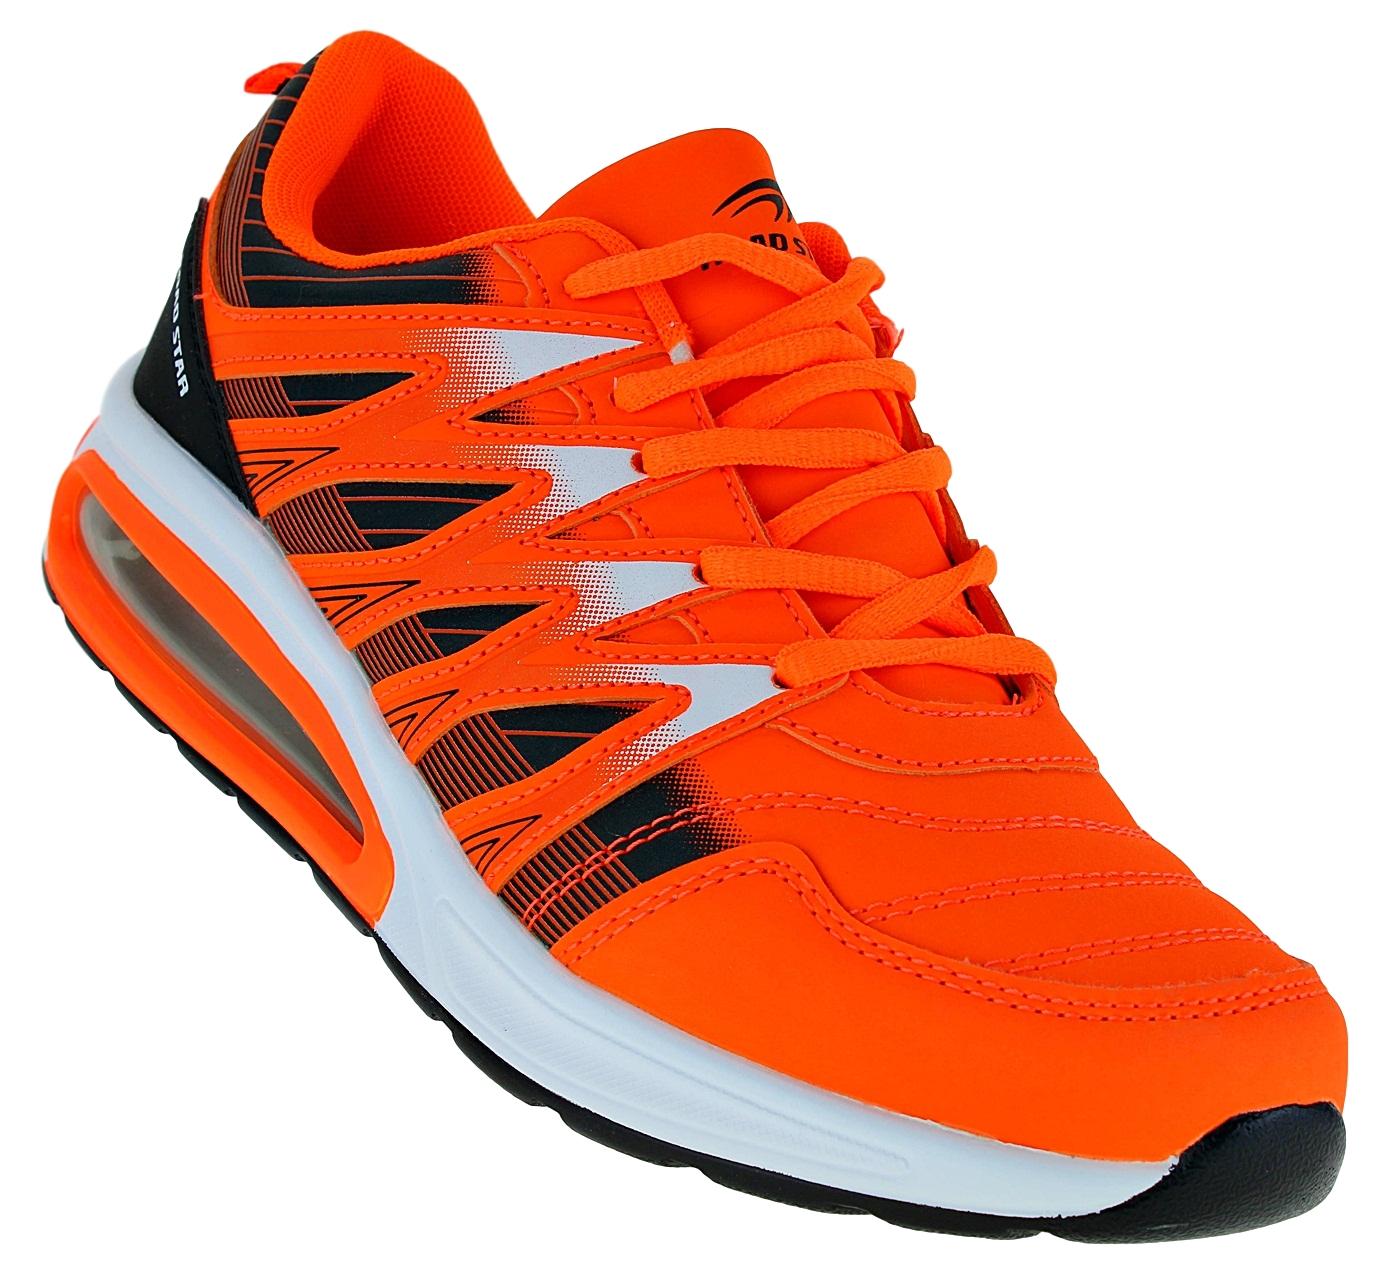 Sportschuhe Sneaker 220 Turnschuhe Art LUFTPOLSTER Schuhe Neon Neu Herren 6YfgybvI7